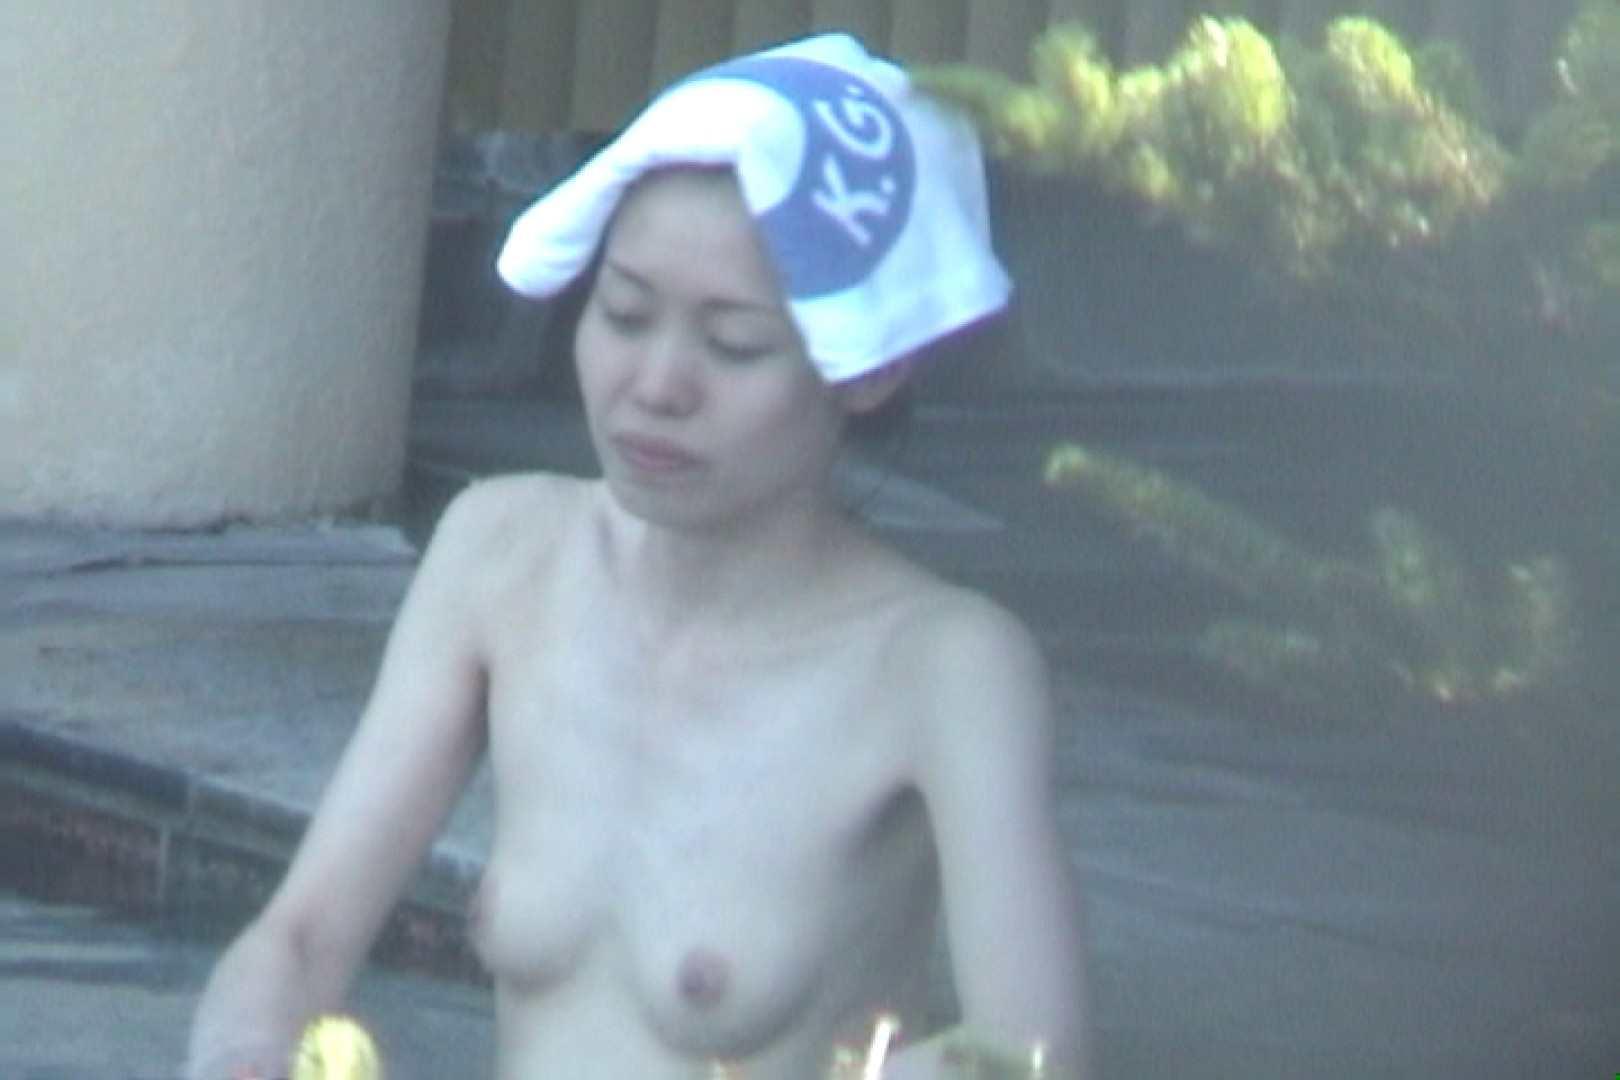 Aquaな露天風呂Vol.576 露天 AV無料動画キャプチャ 13pic 8